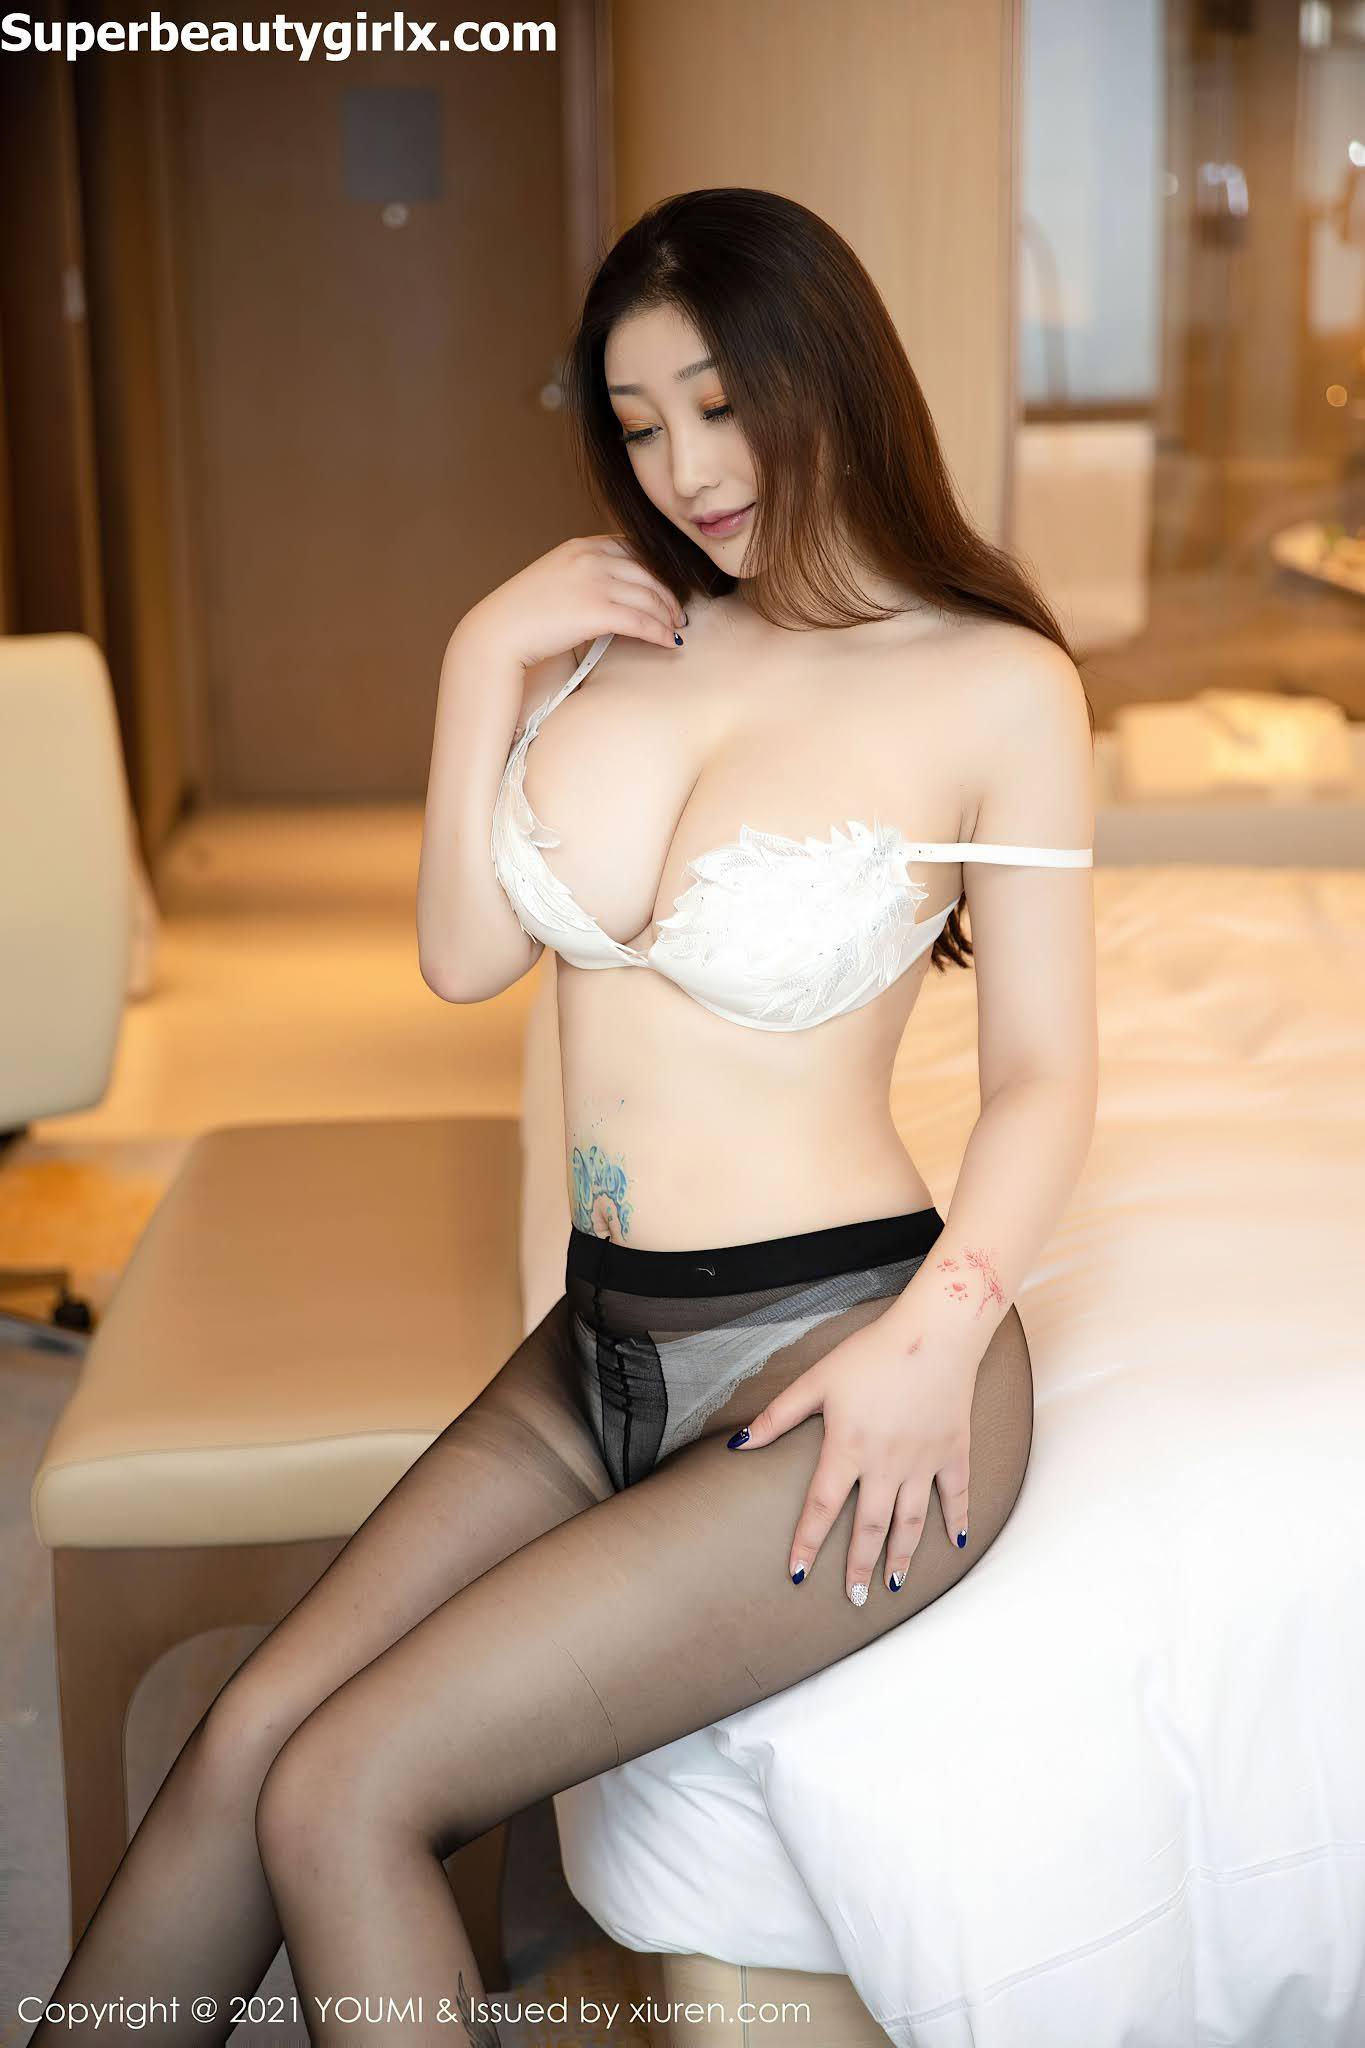 YouMi-Vol.607-Daji-Toxic-Toxic-Superbeautygirlx.com